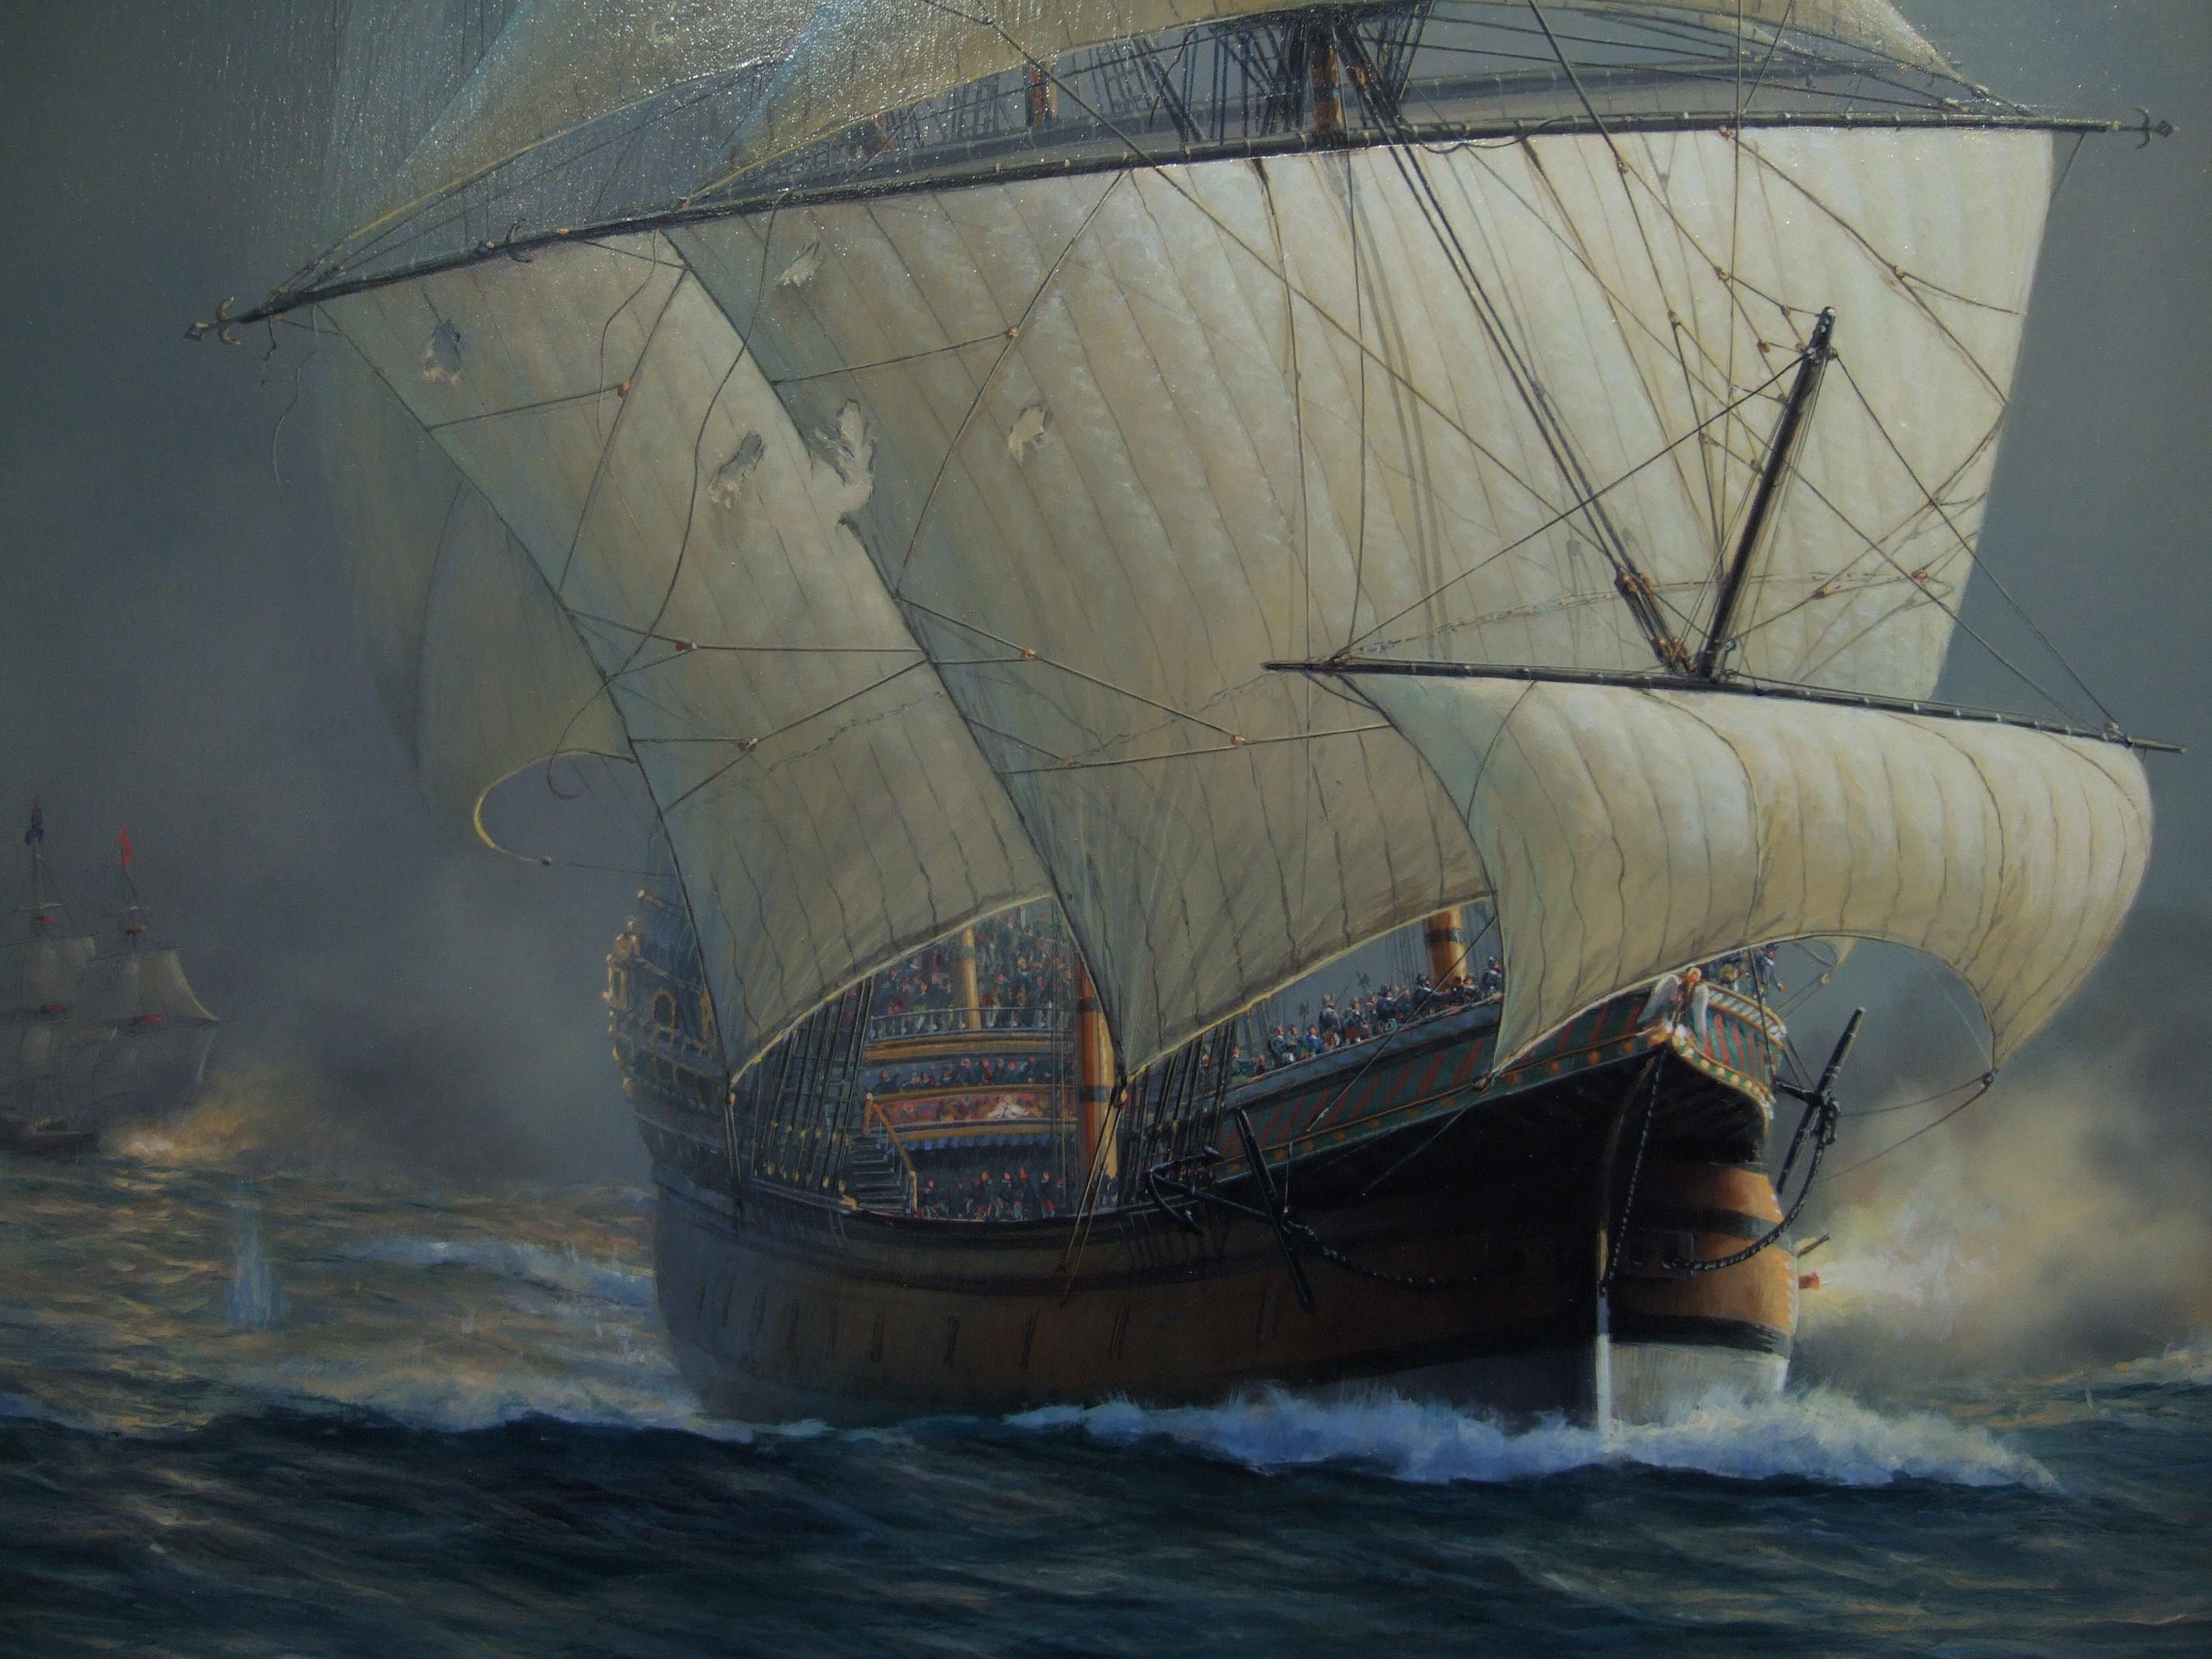 st augustine life st augustine life blog spanish galleon to